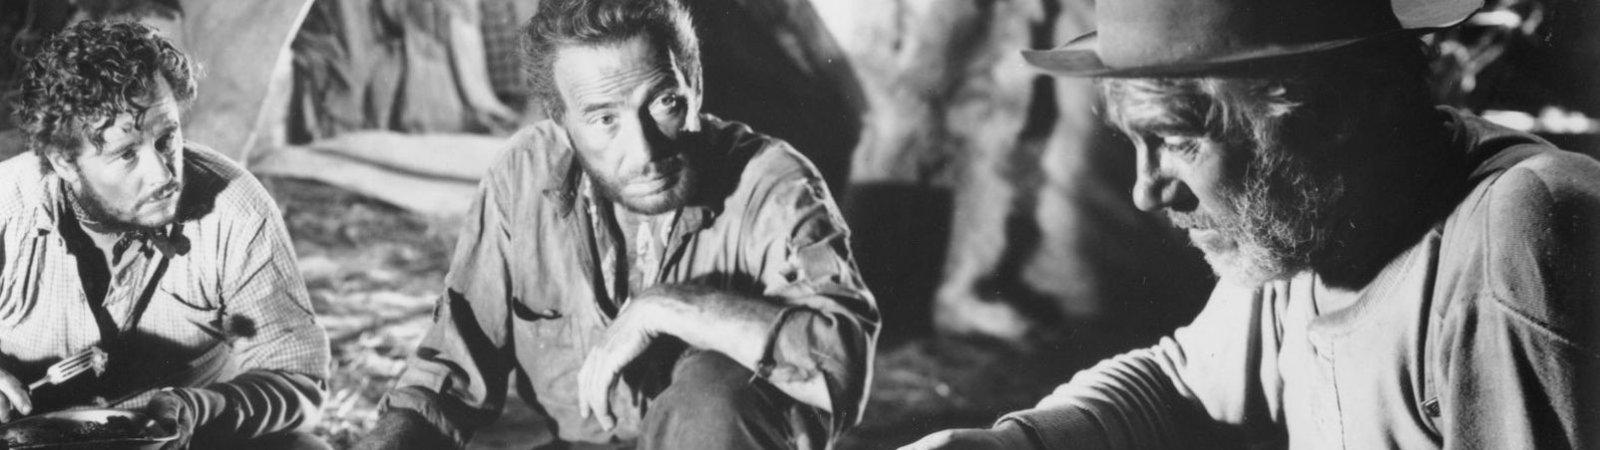 Photo du film : Le tresor de la sierra madre